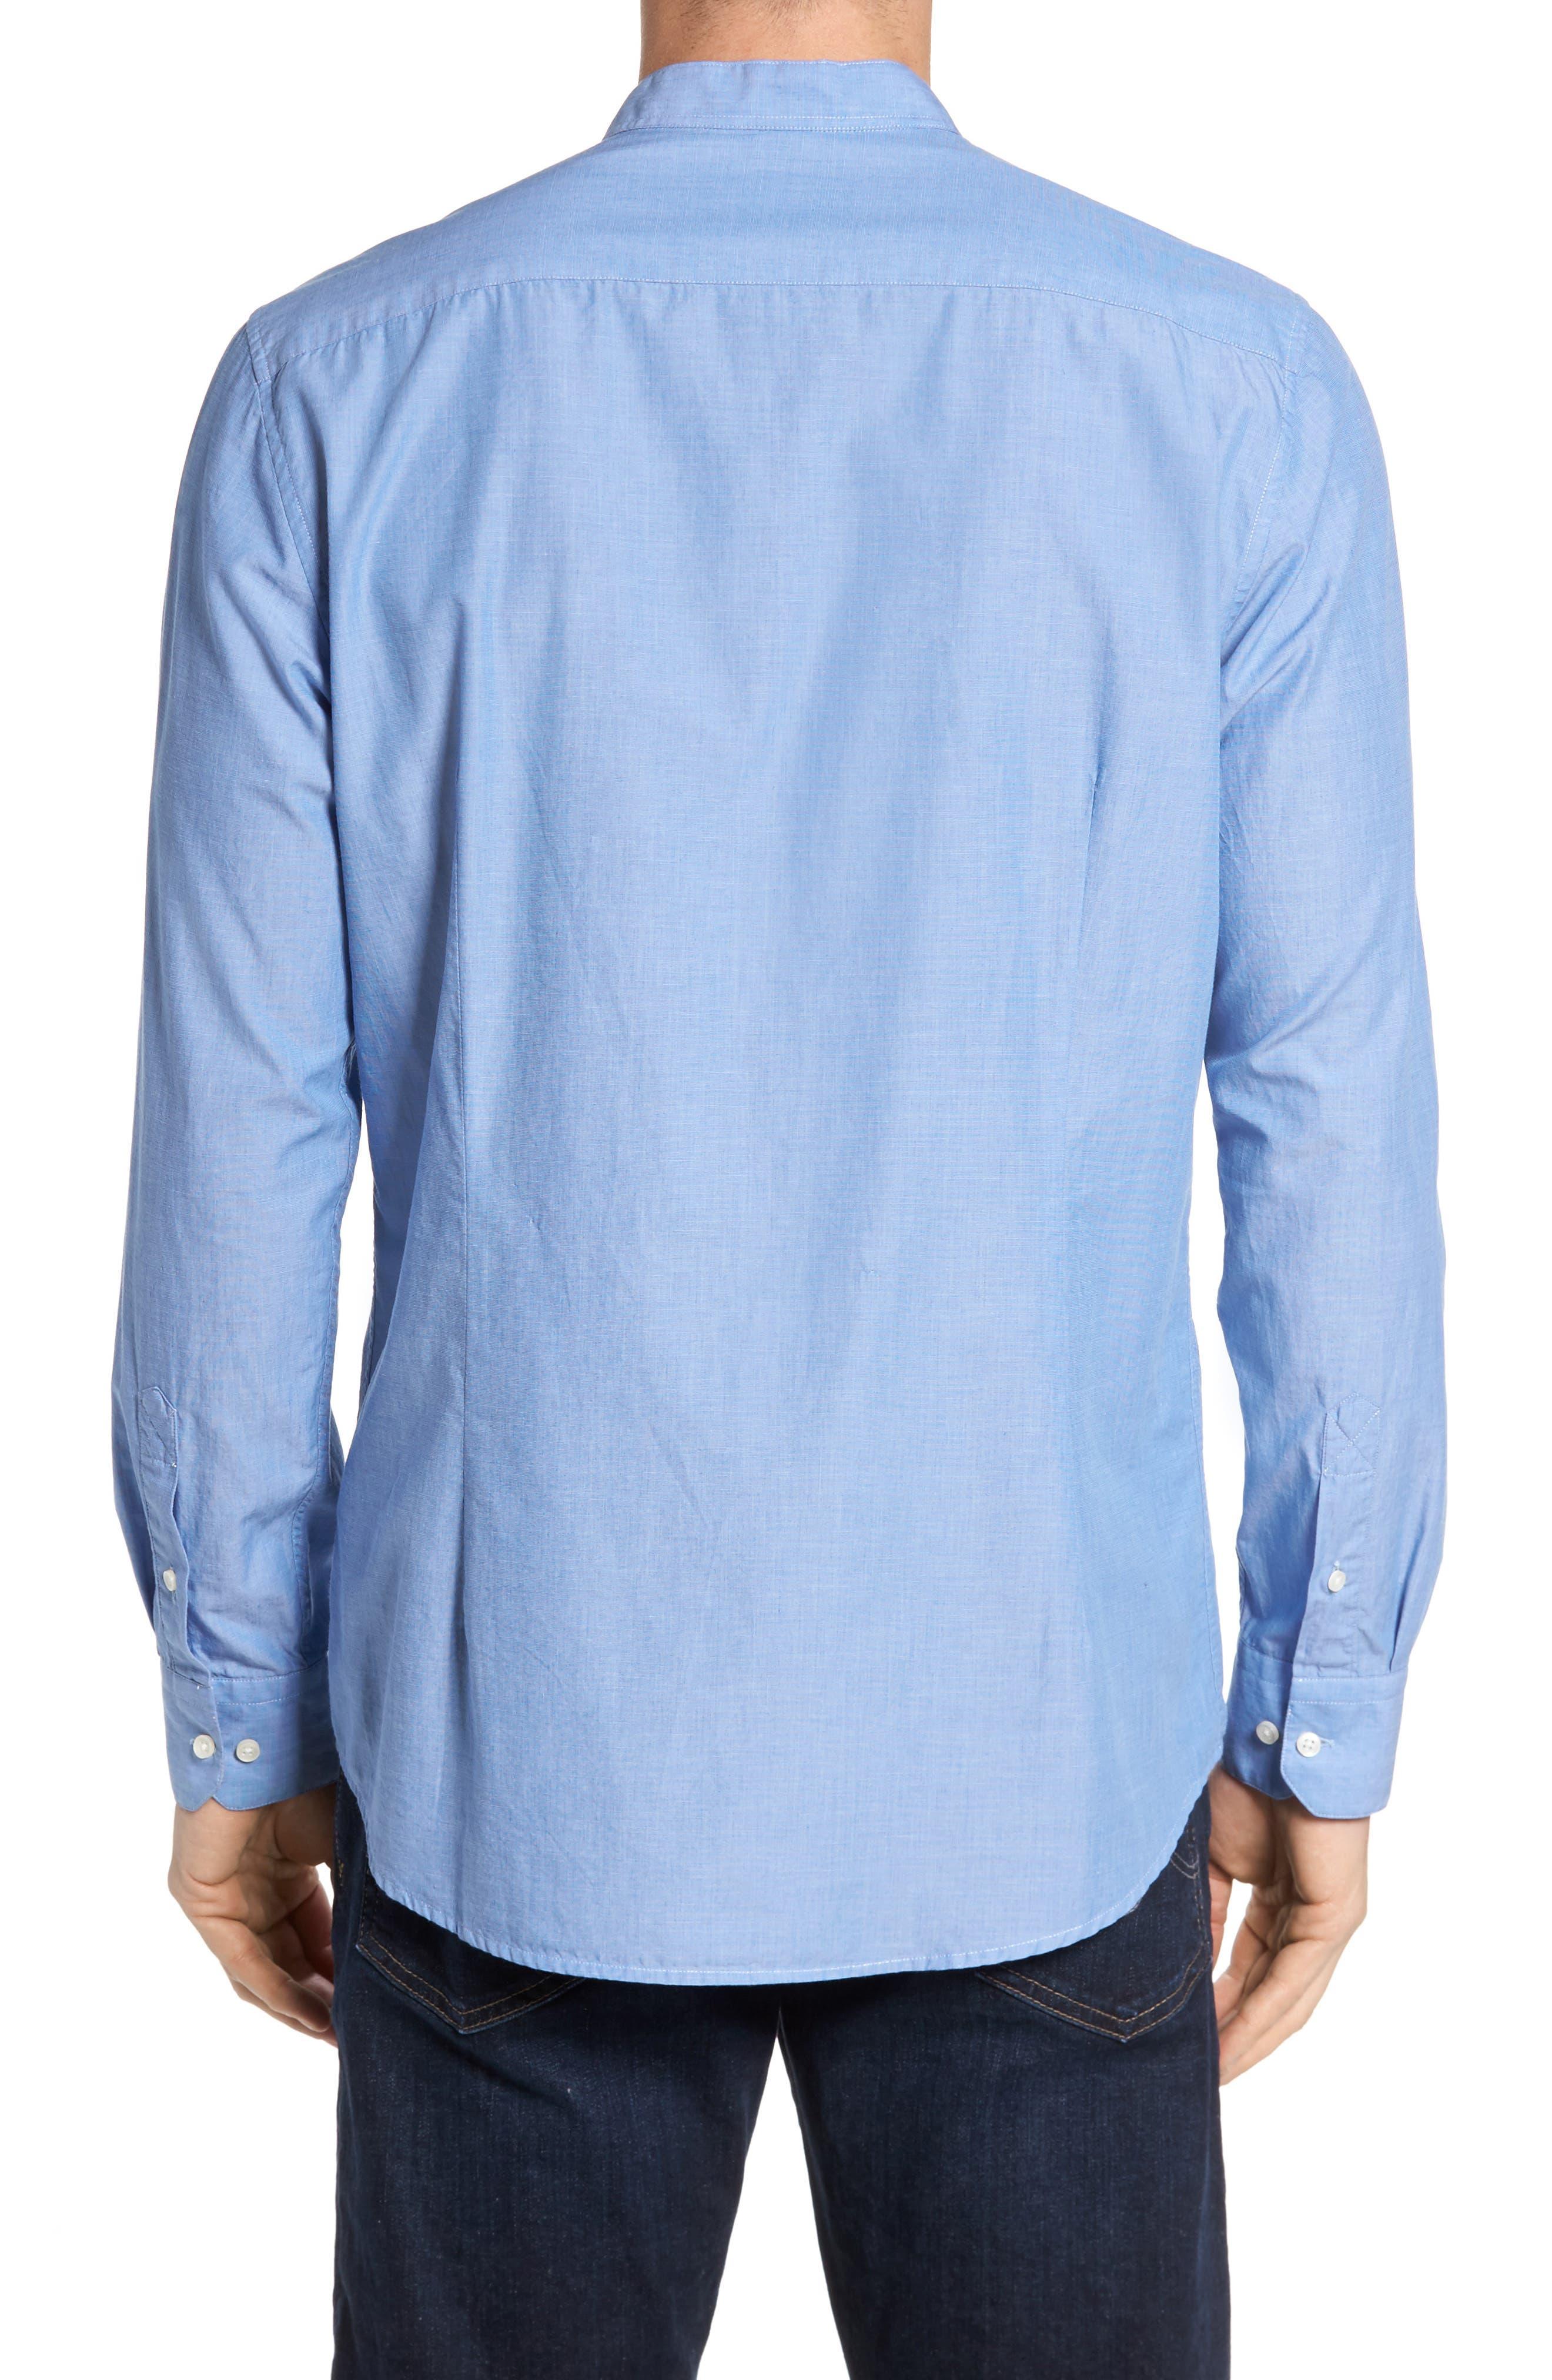 Fairfield Tailored Fit Sport Shirt,                             Alternate thumbnail 2, color,                             450